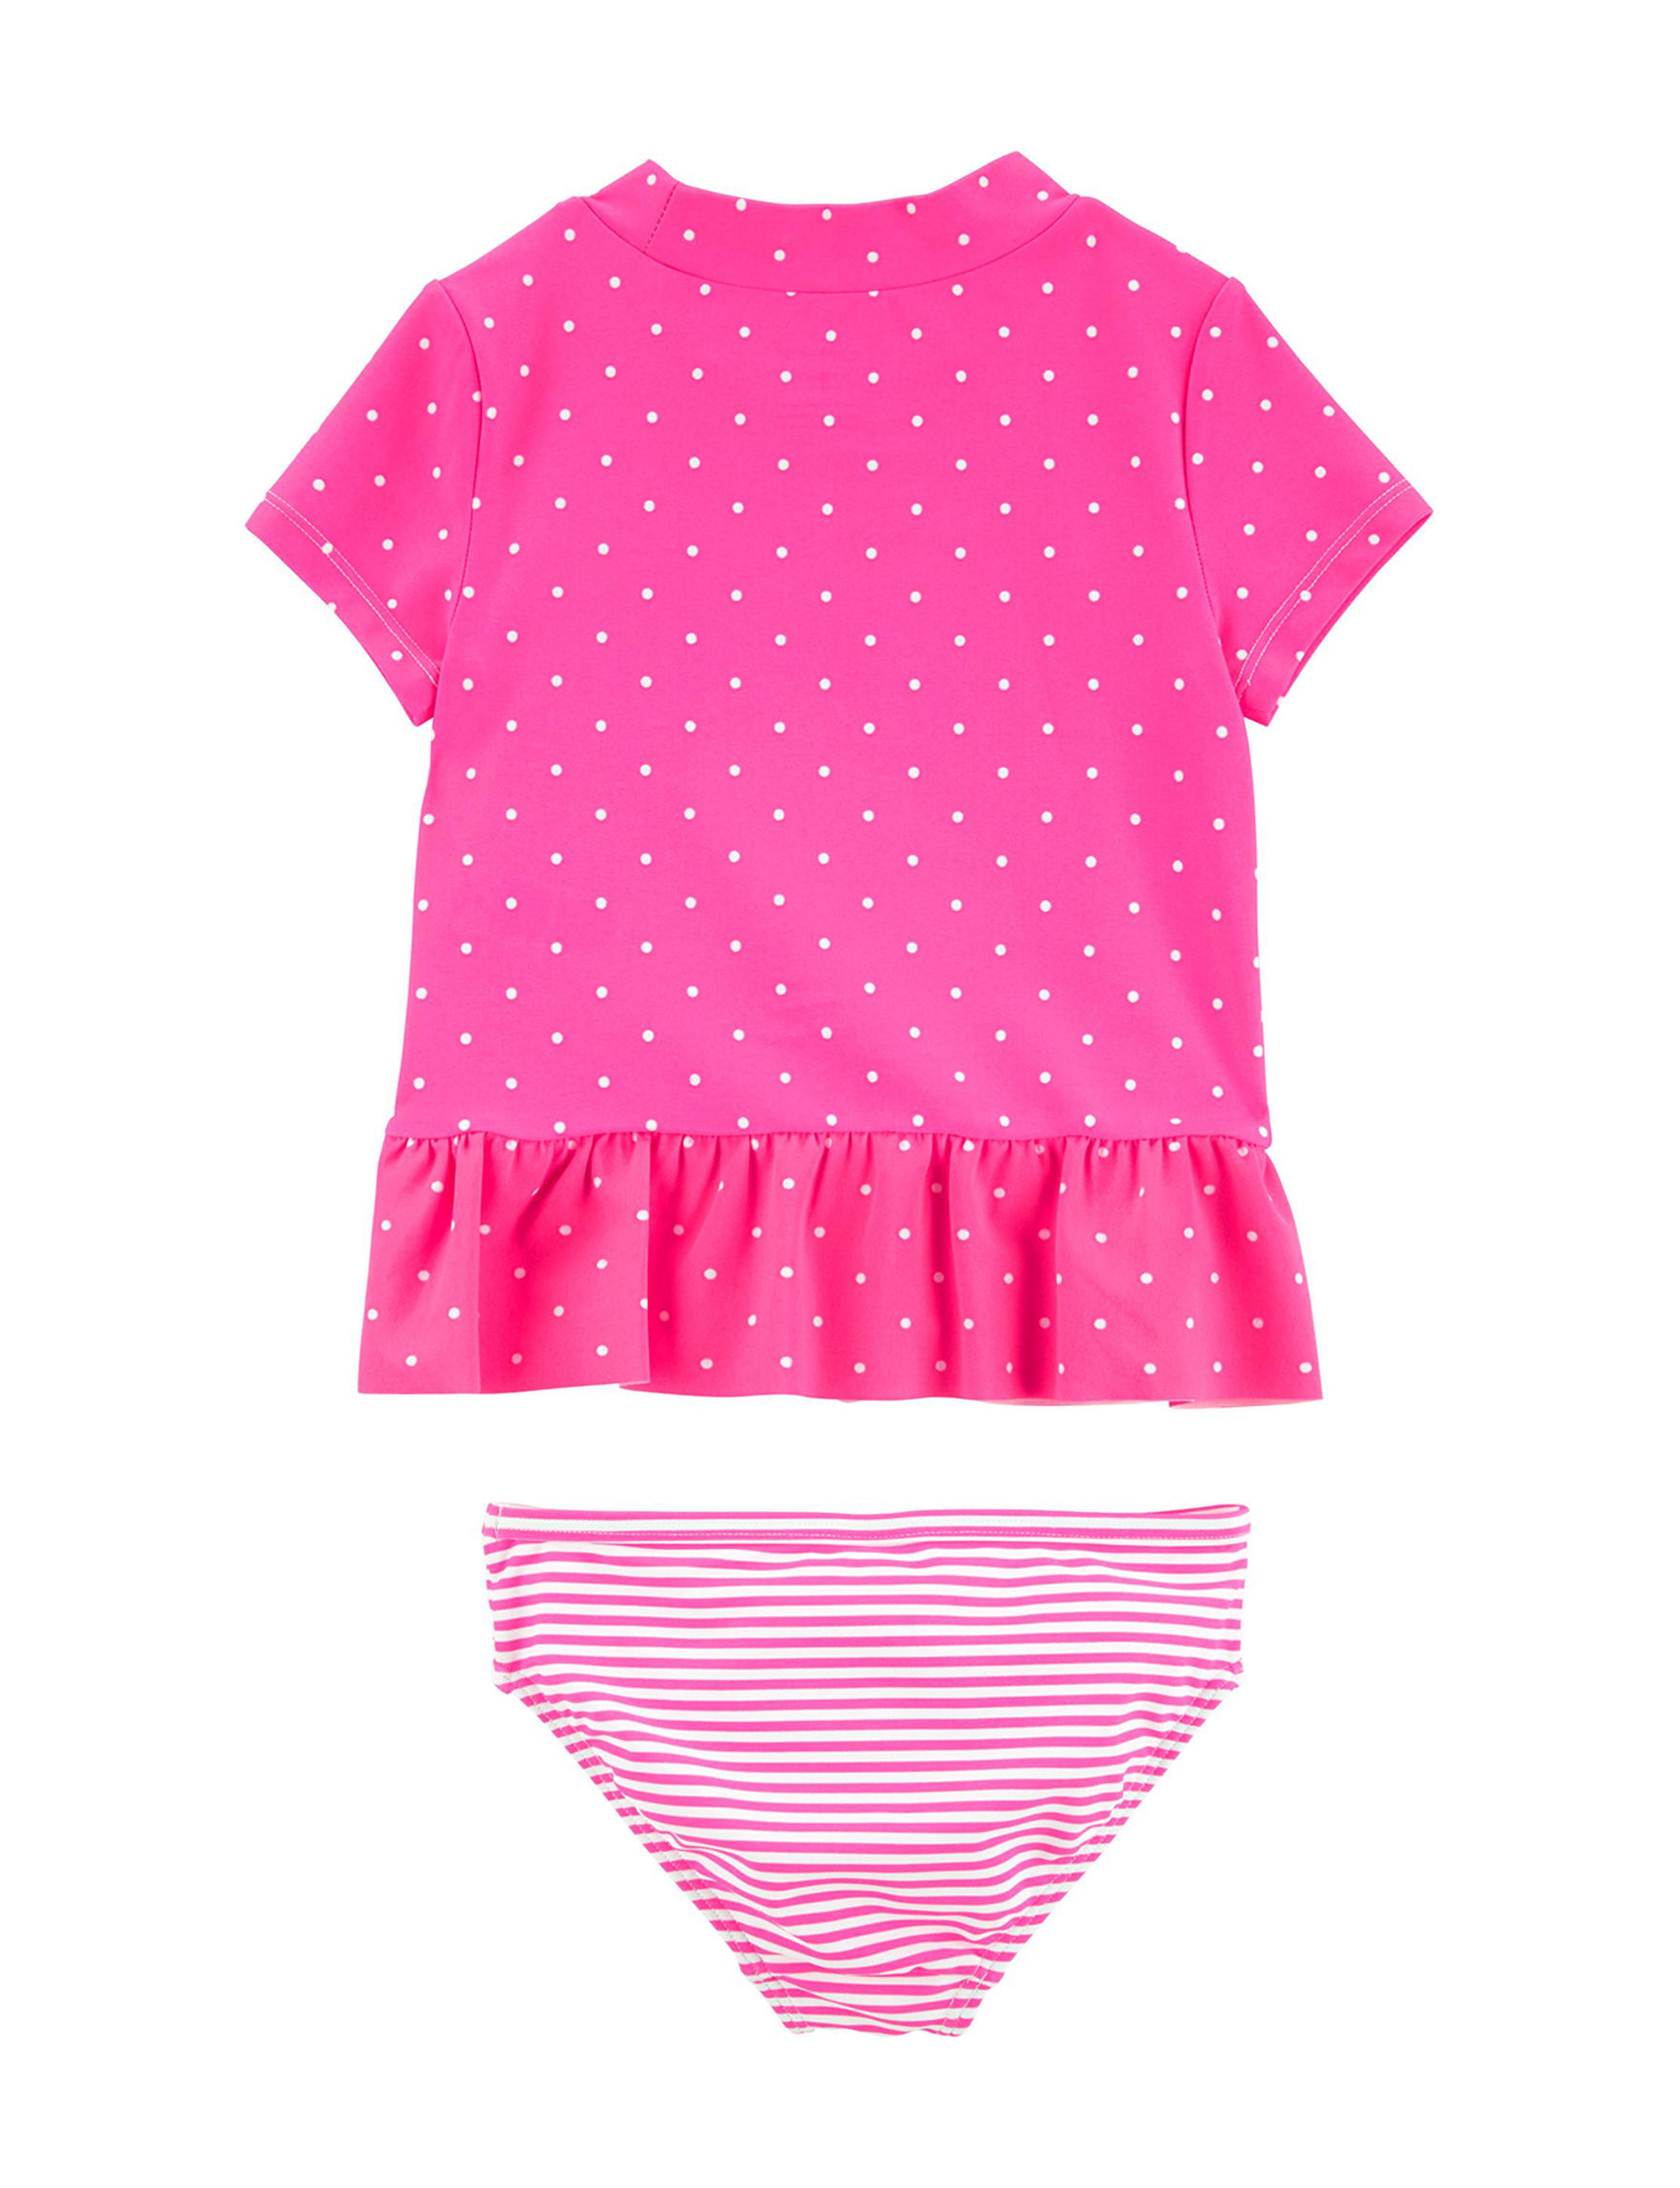 9790d92d2 Carter's 2-pc. Polka Dot Flamingo Ruffle Rashguard Swim Set - Toddler Girls